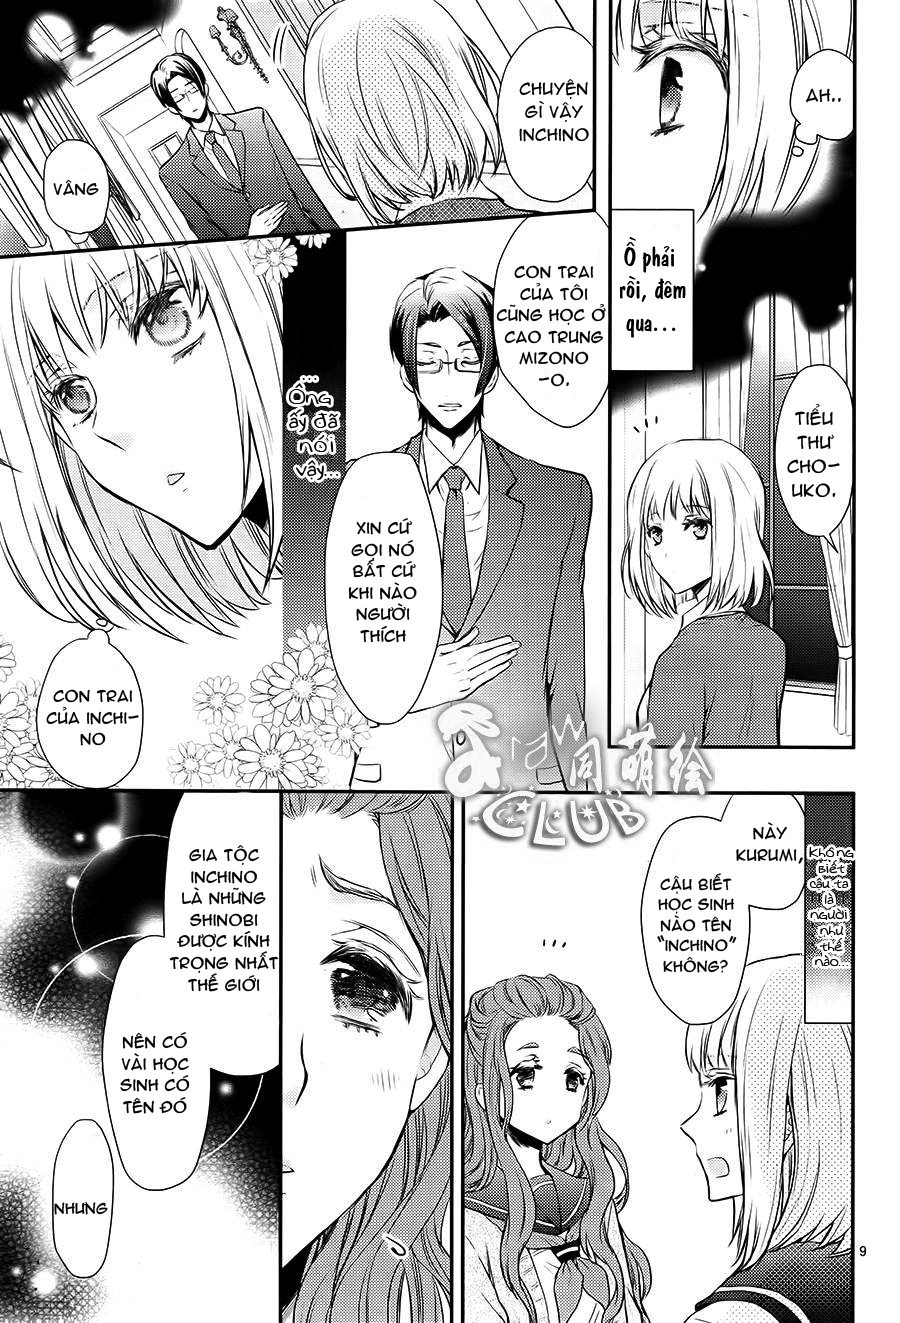 Pin auf Shojo Manga Reference